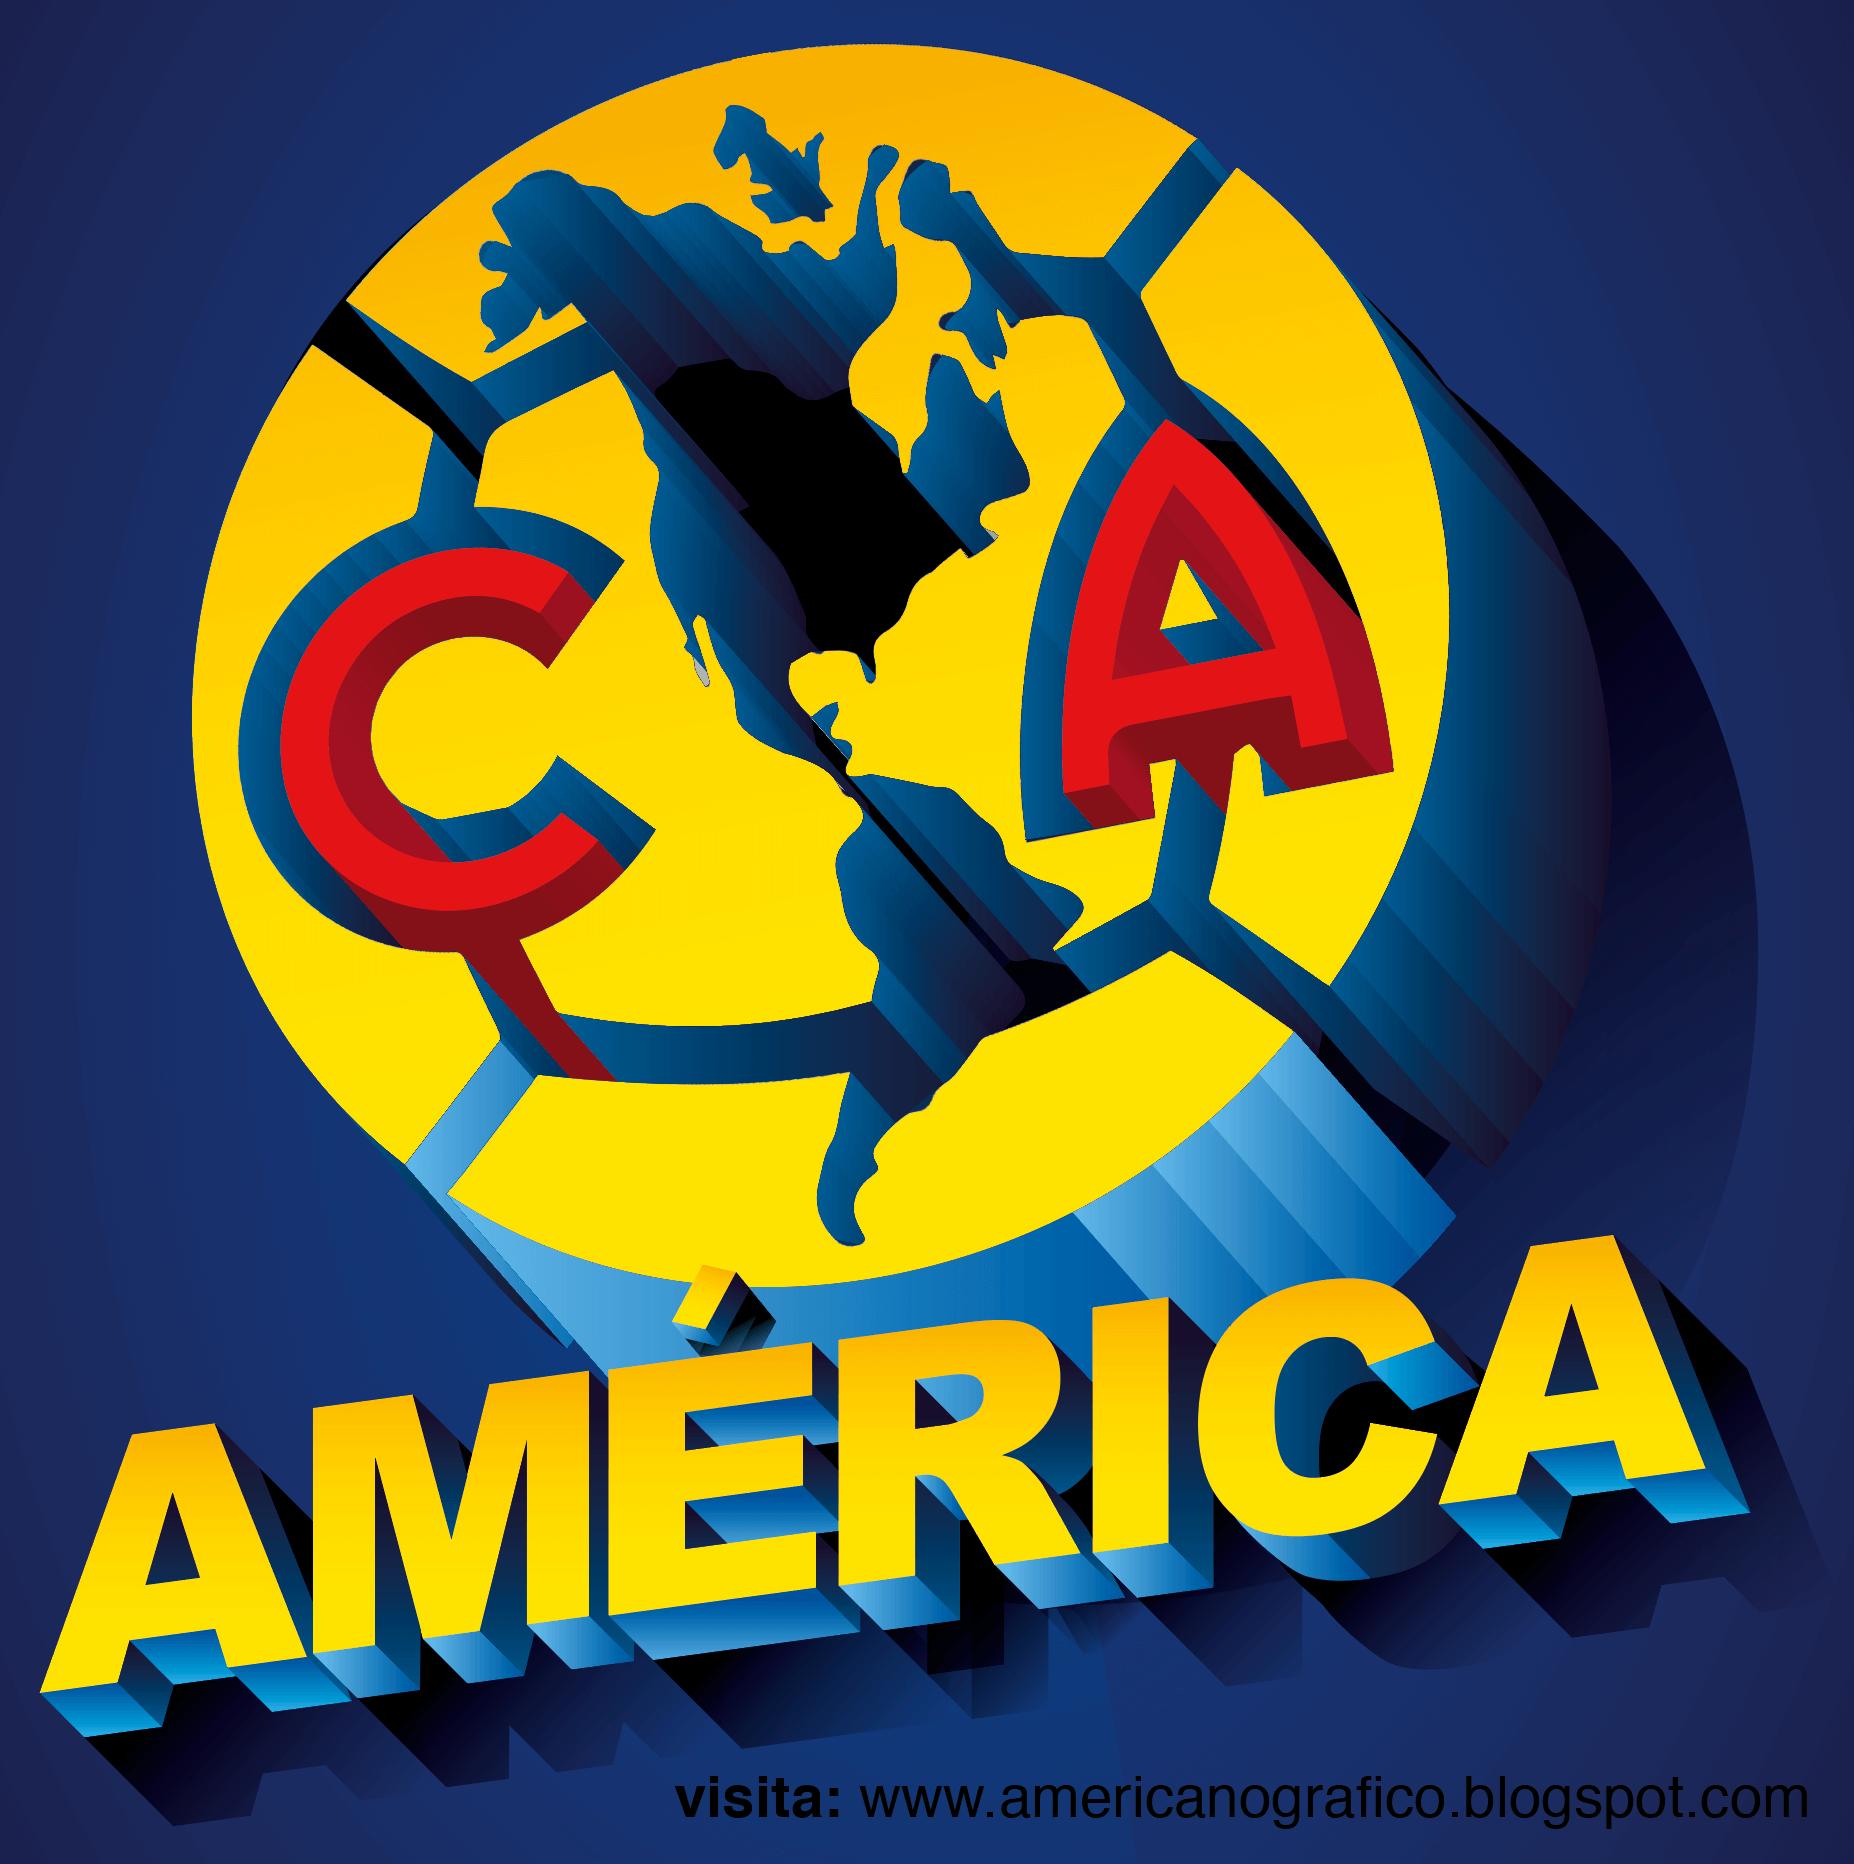 Mi Razon De Existir Club America Club De Futbol America Playera Club America